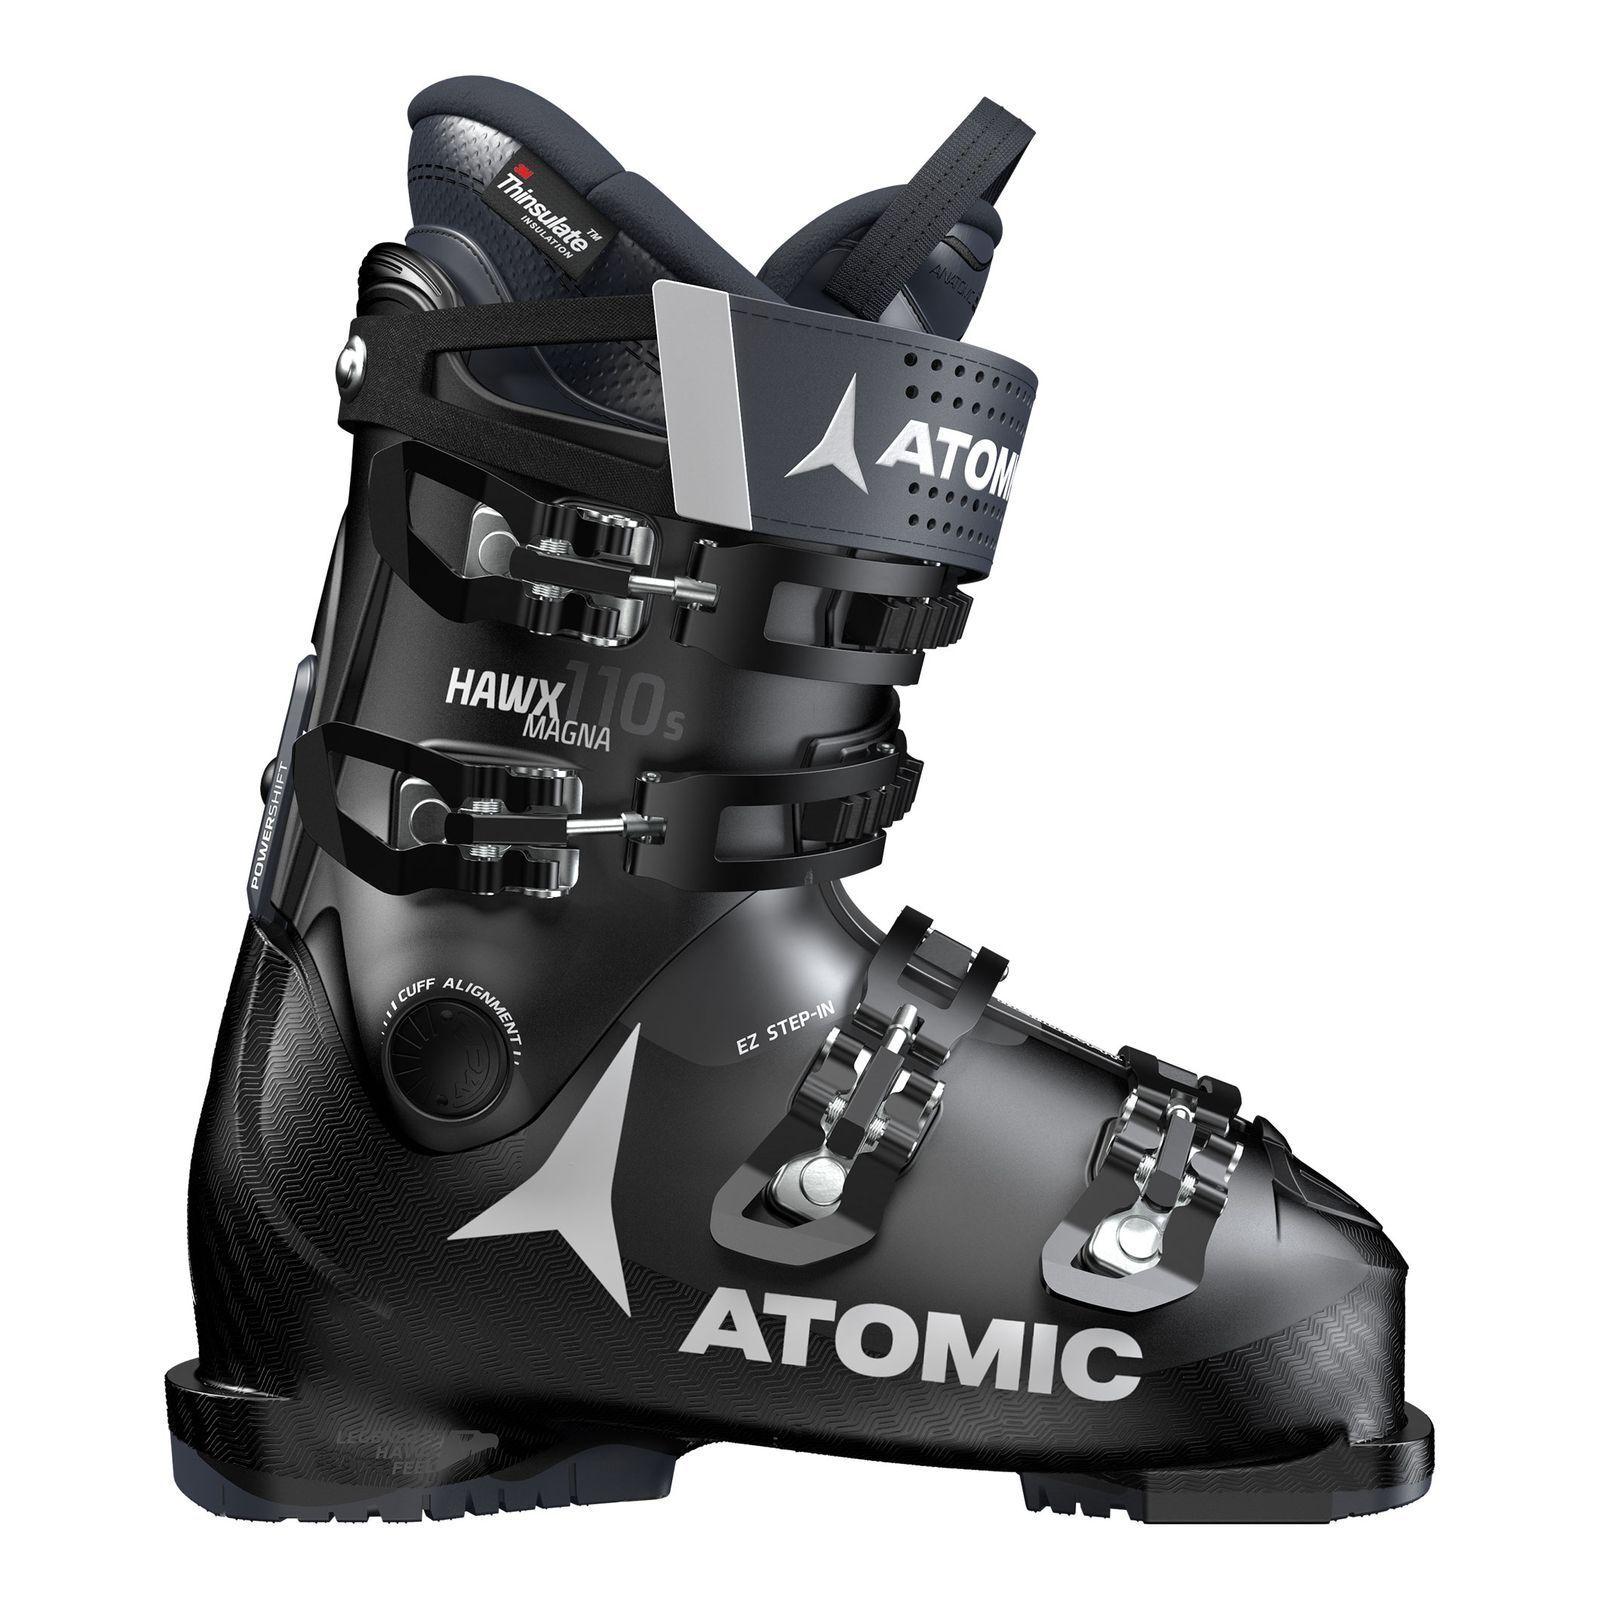 Atomic Hommes Chaussure Ski Chaussure Chaussure Hommes de Ski Hawx Magna 110 S NOIR / Bleu d4cfd4